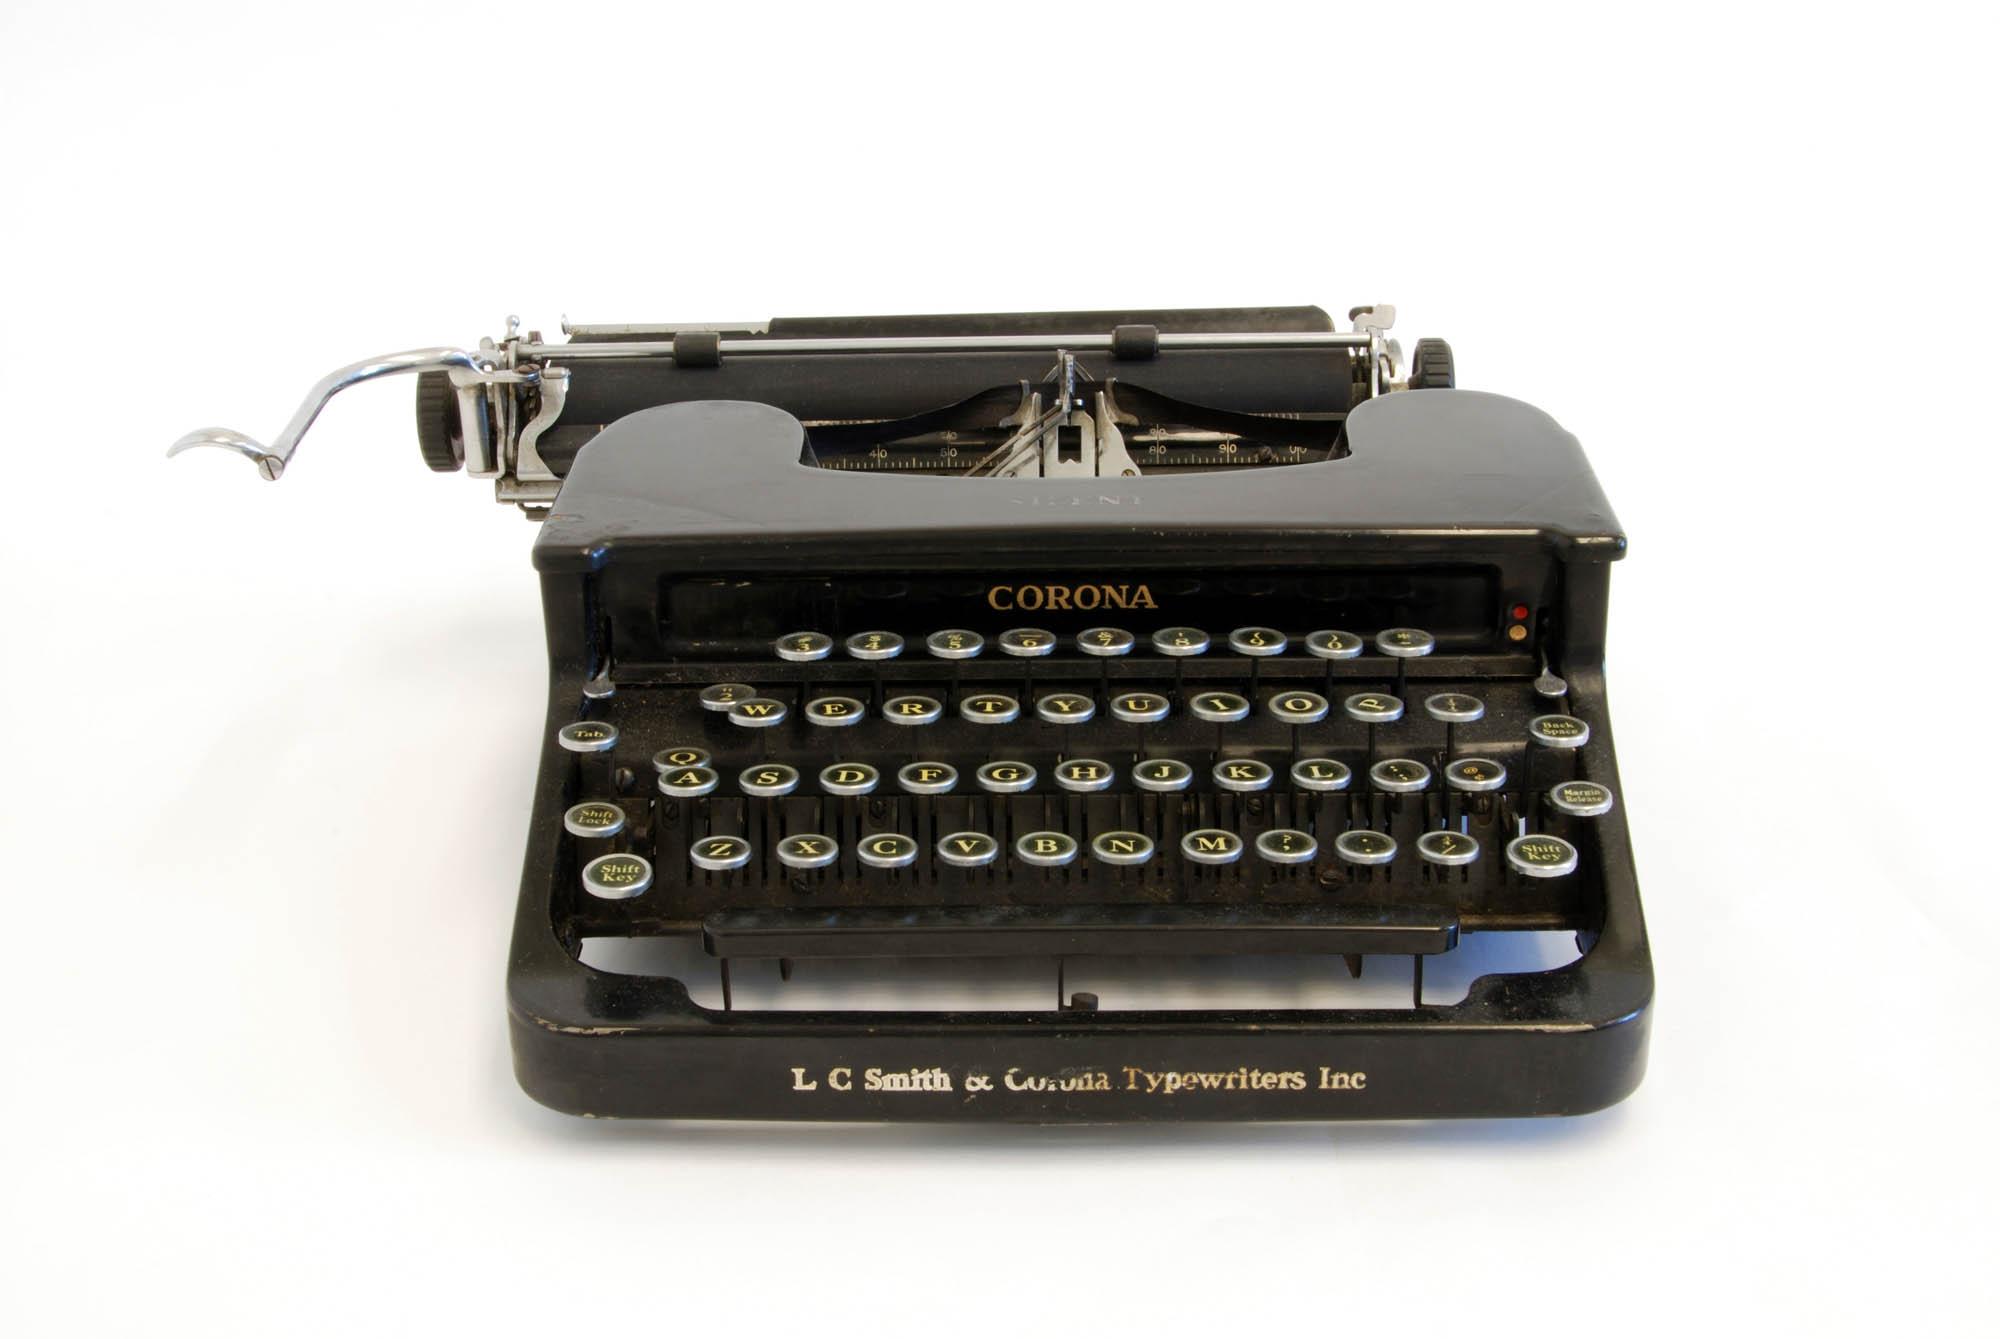 Smith & Corona typewriter